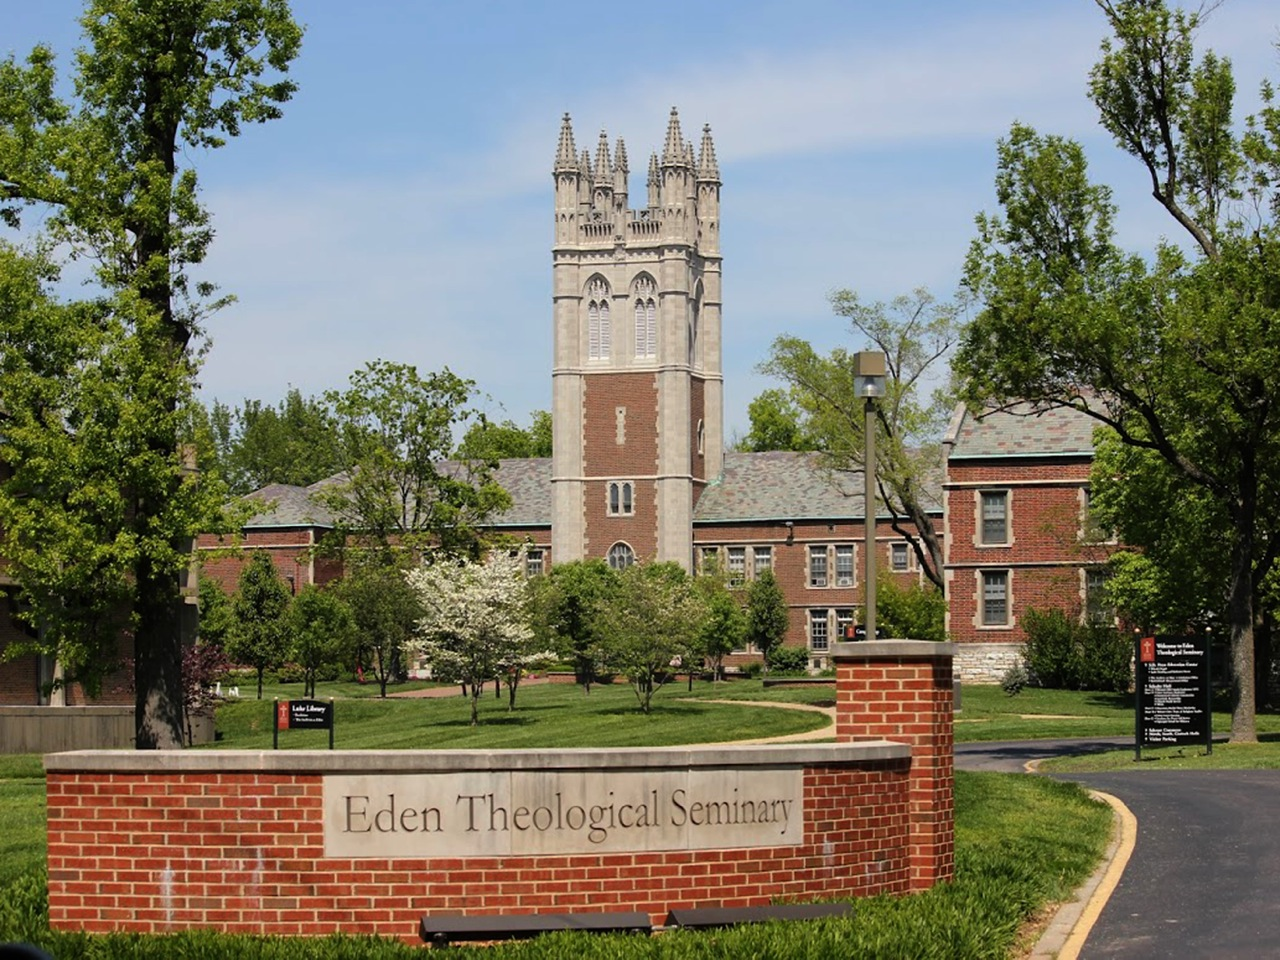 eden-theological-seminary.jpg